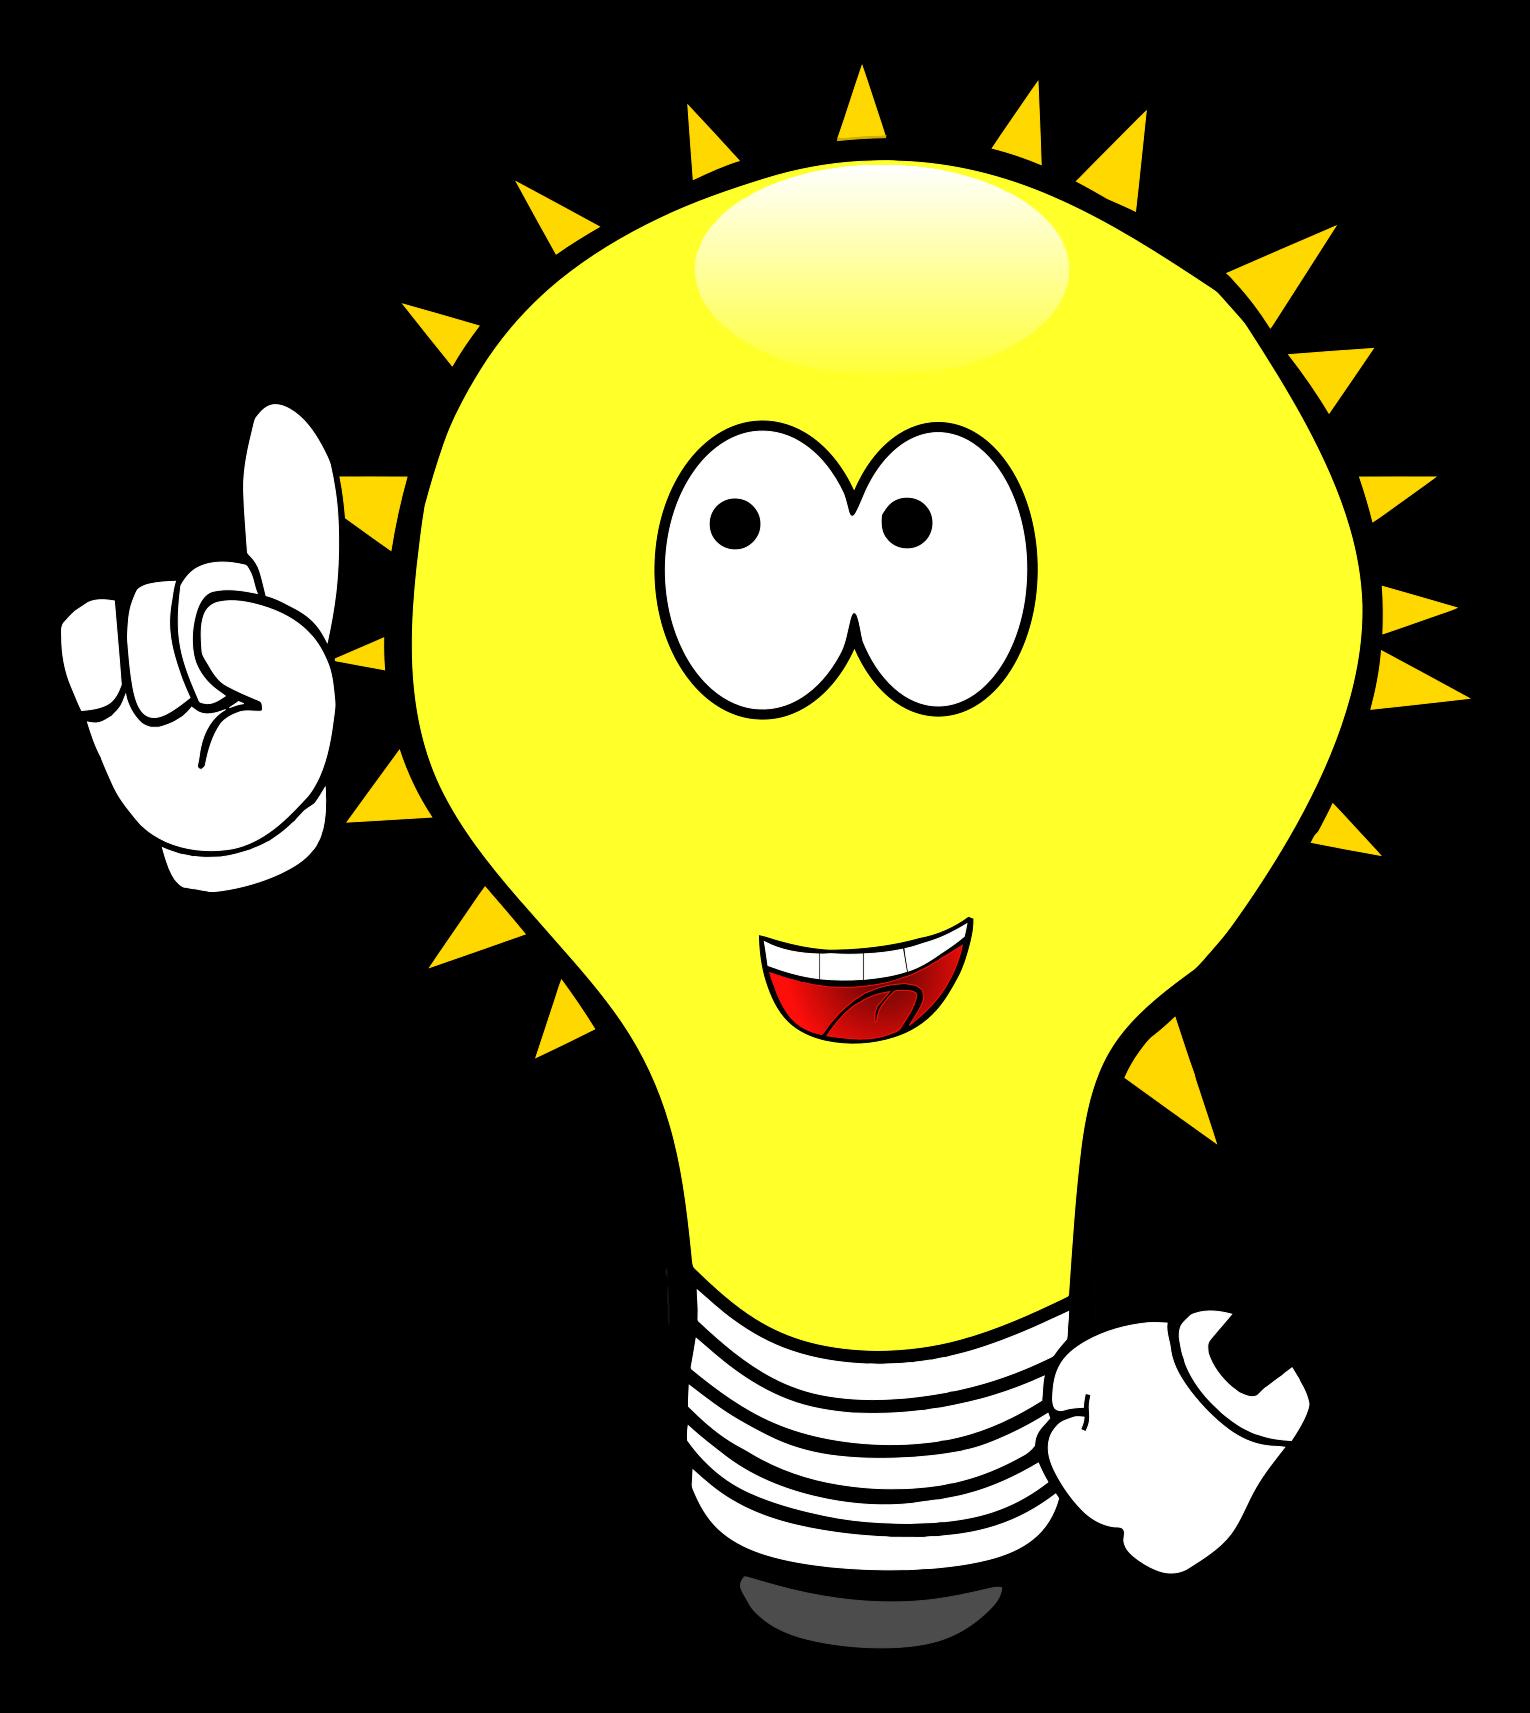 Bright Cartoon Lightbulb Clip Art Image - ClipSafari